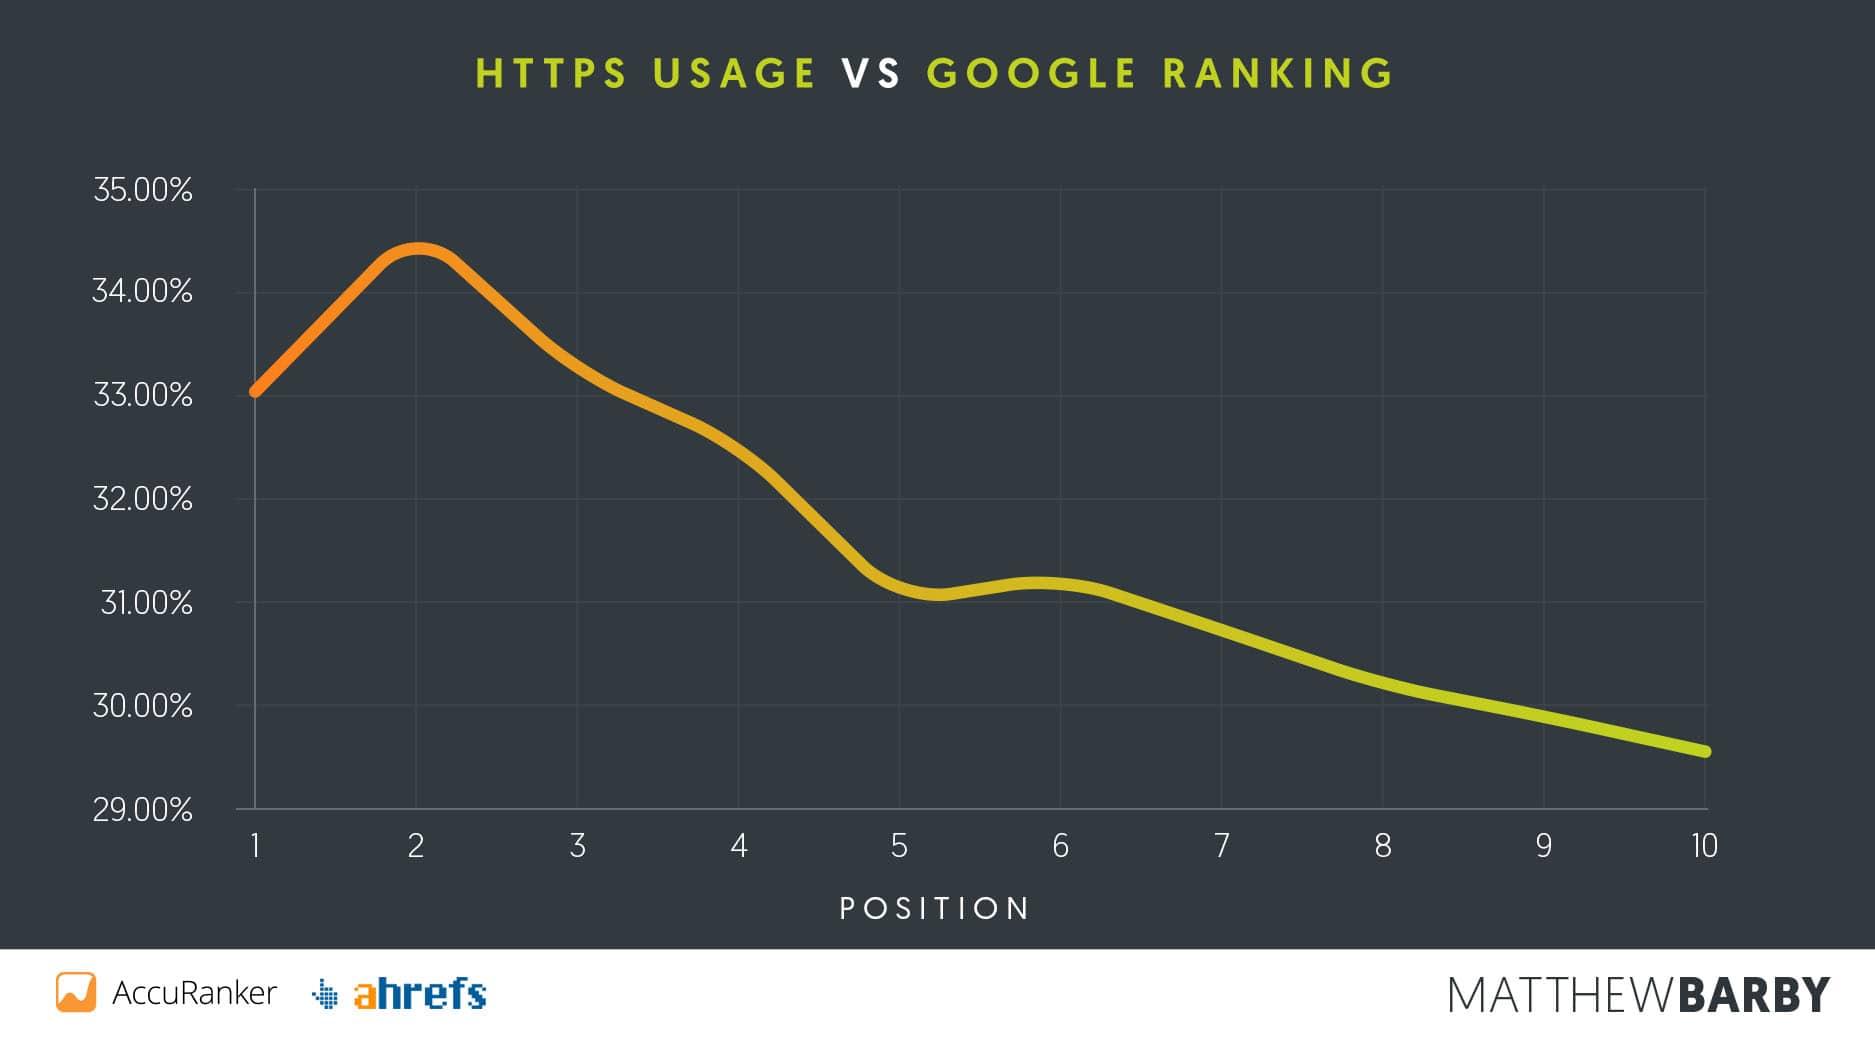 Utilisation du HTTPS vs classement Google